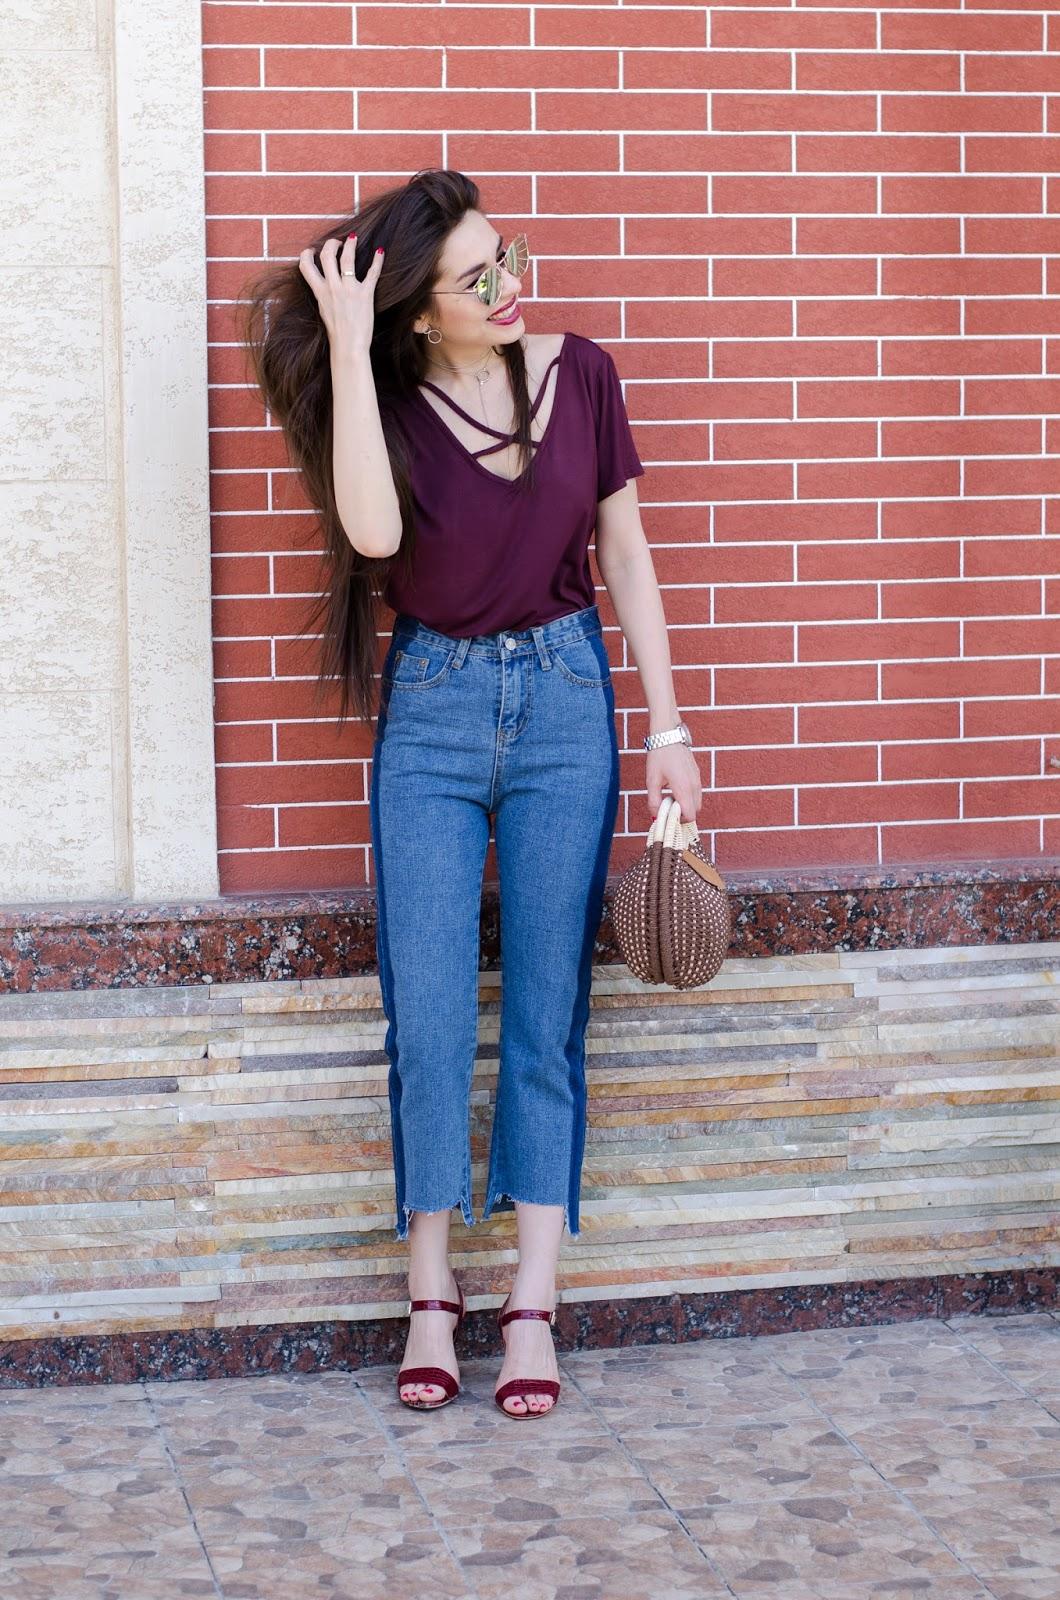 fashion blogger diyorasnotes diyora beta mom jeans bored top straw tote bag